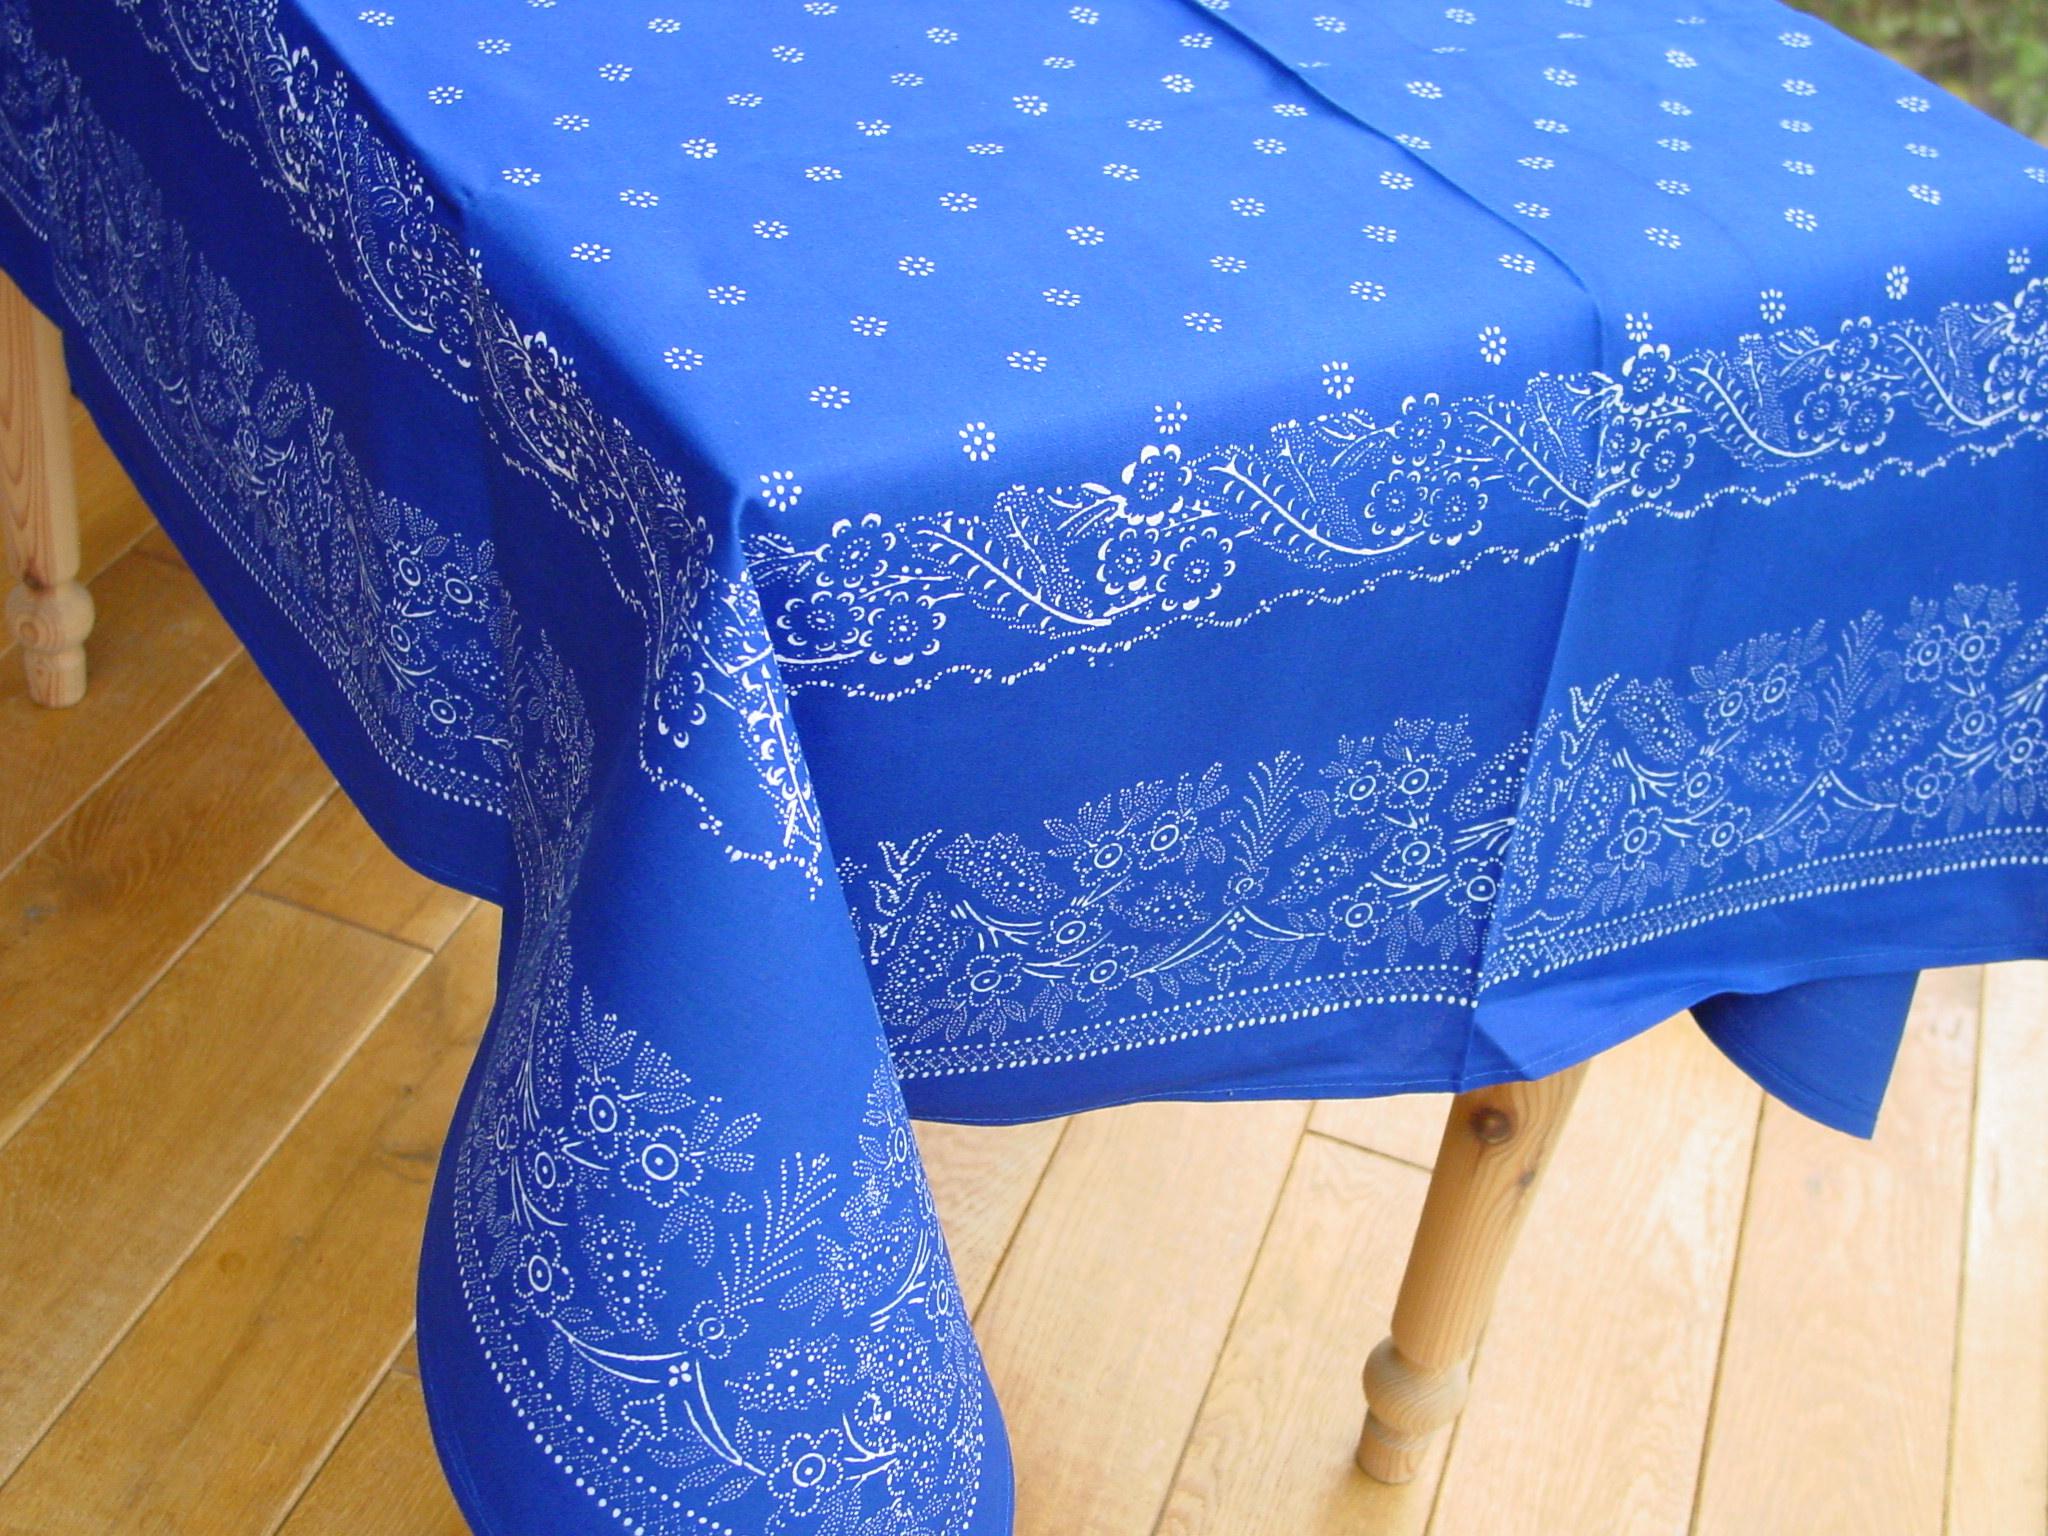 Große Blaudruck-Tischdecke 6481-0